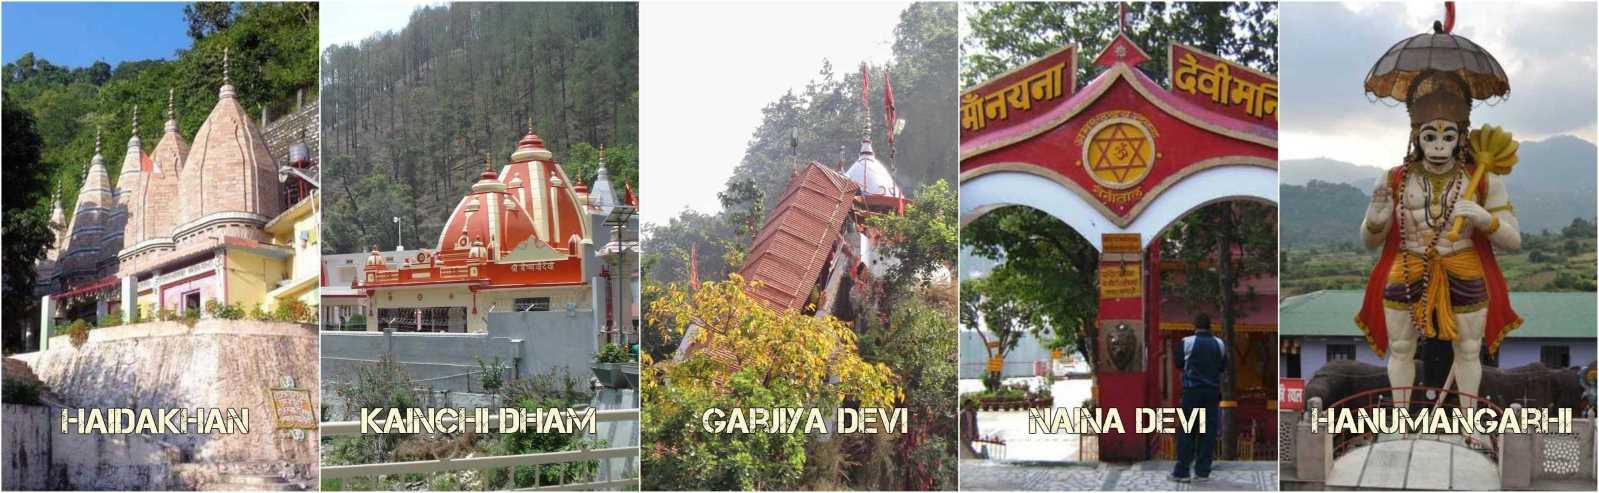 Nainital District Famous Temple